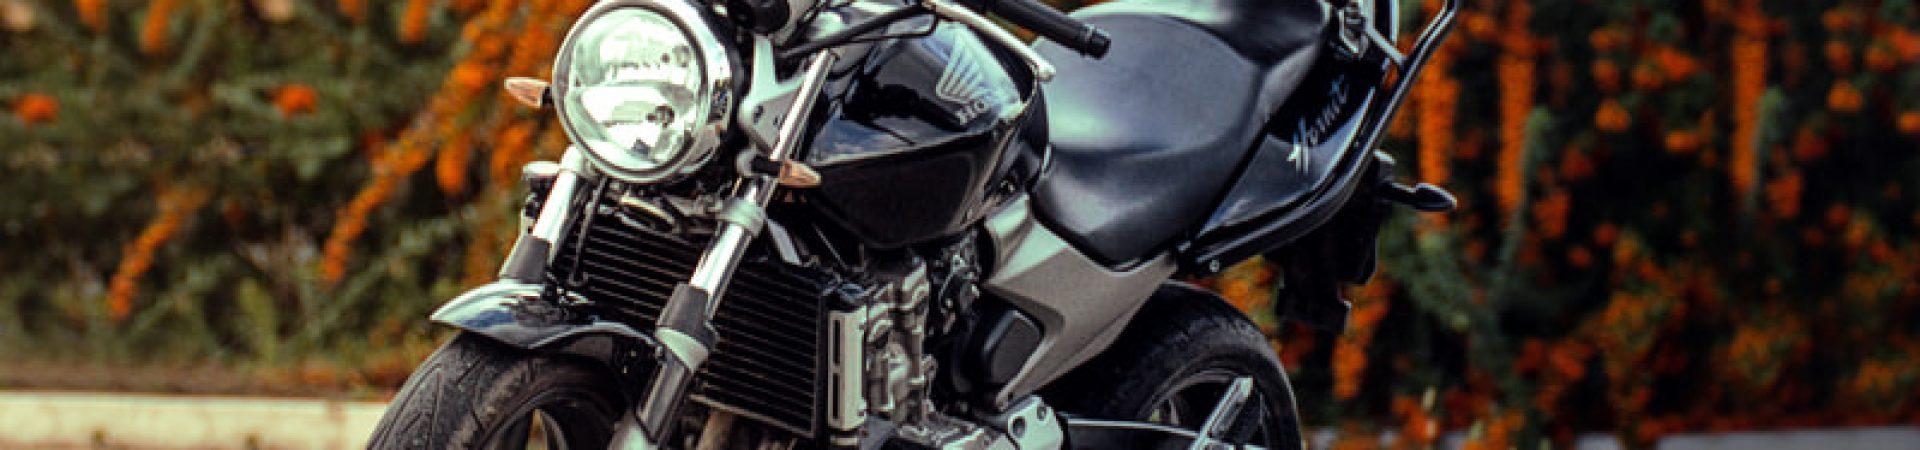 Polaganje za motocikl